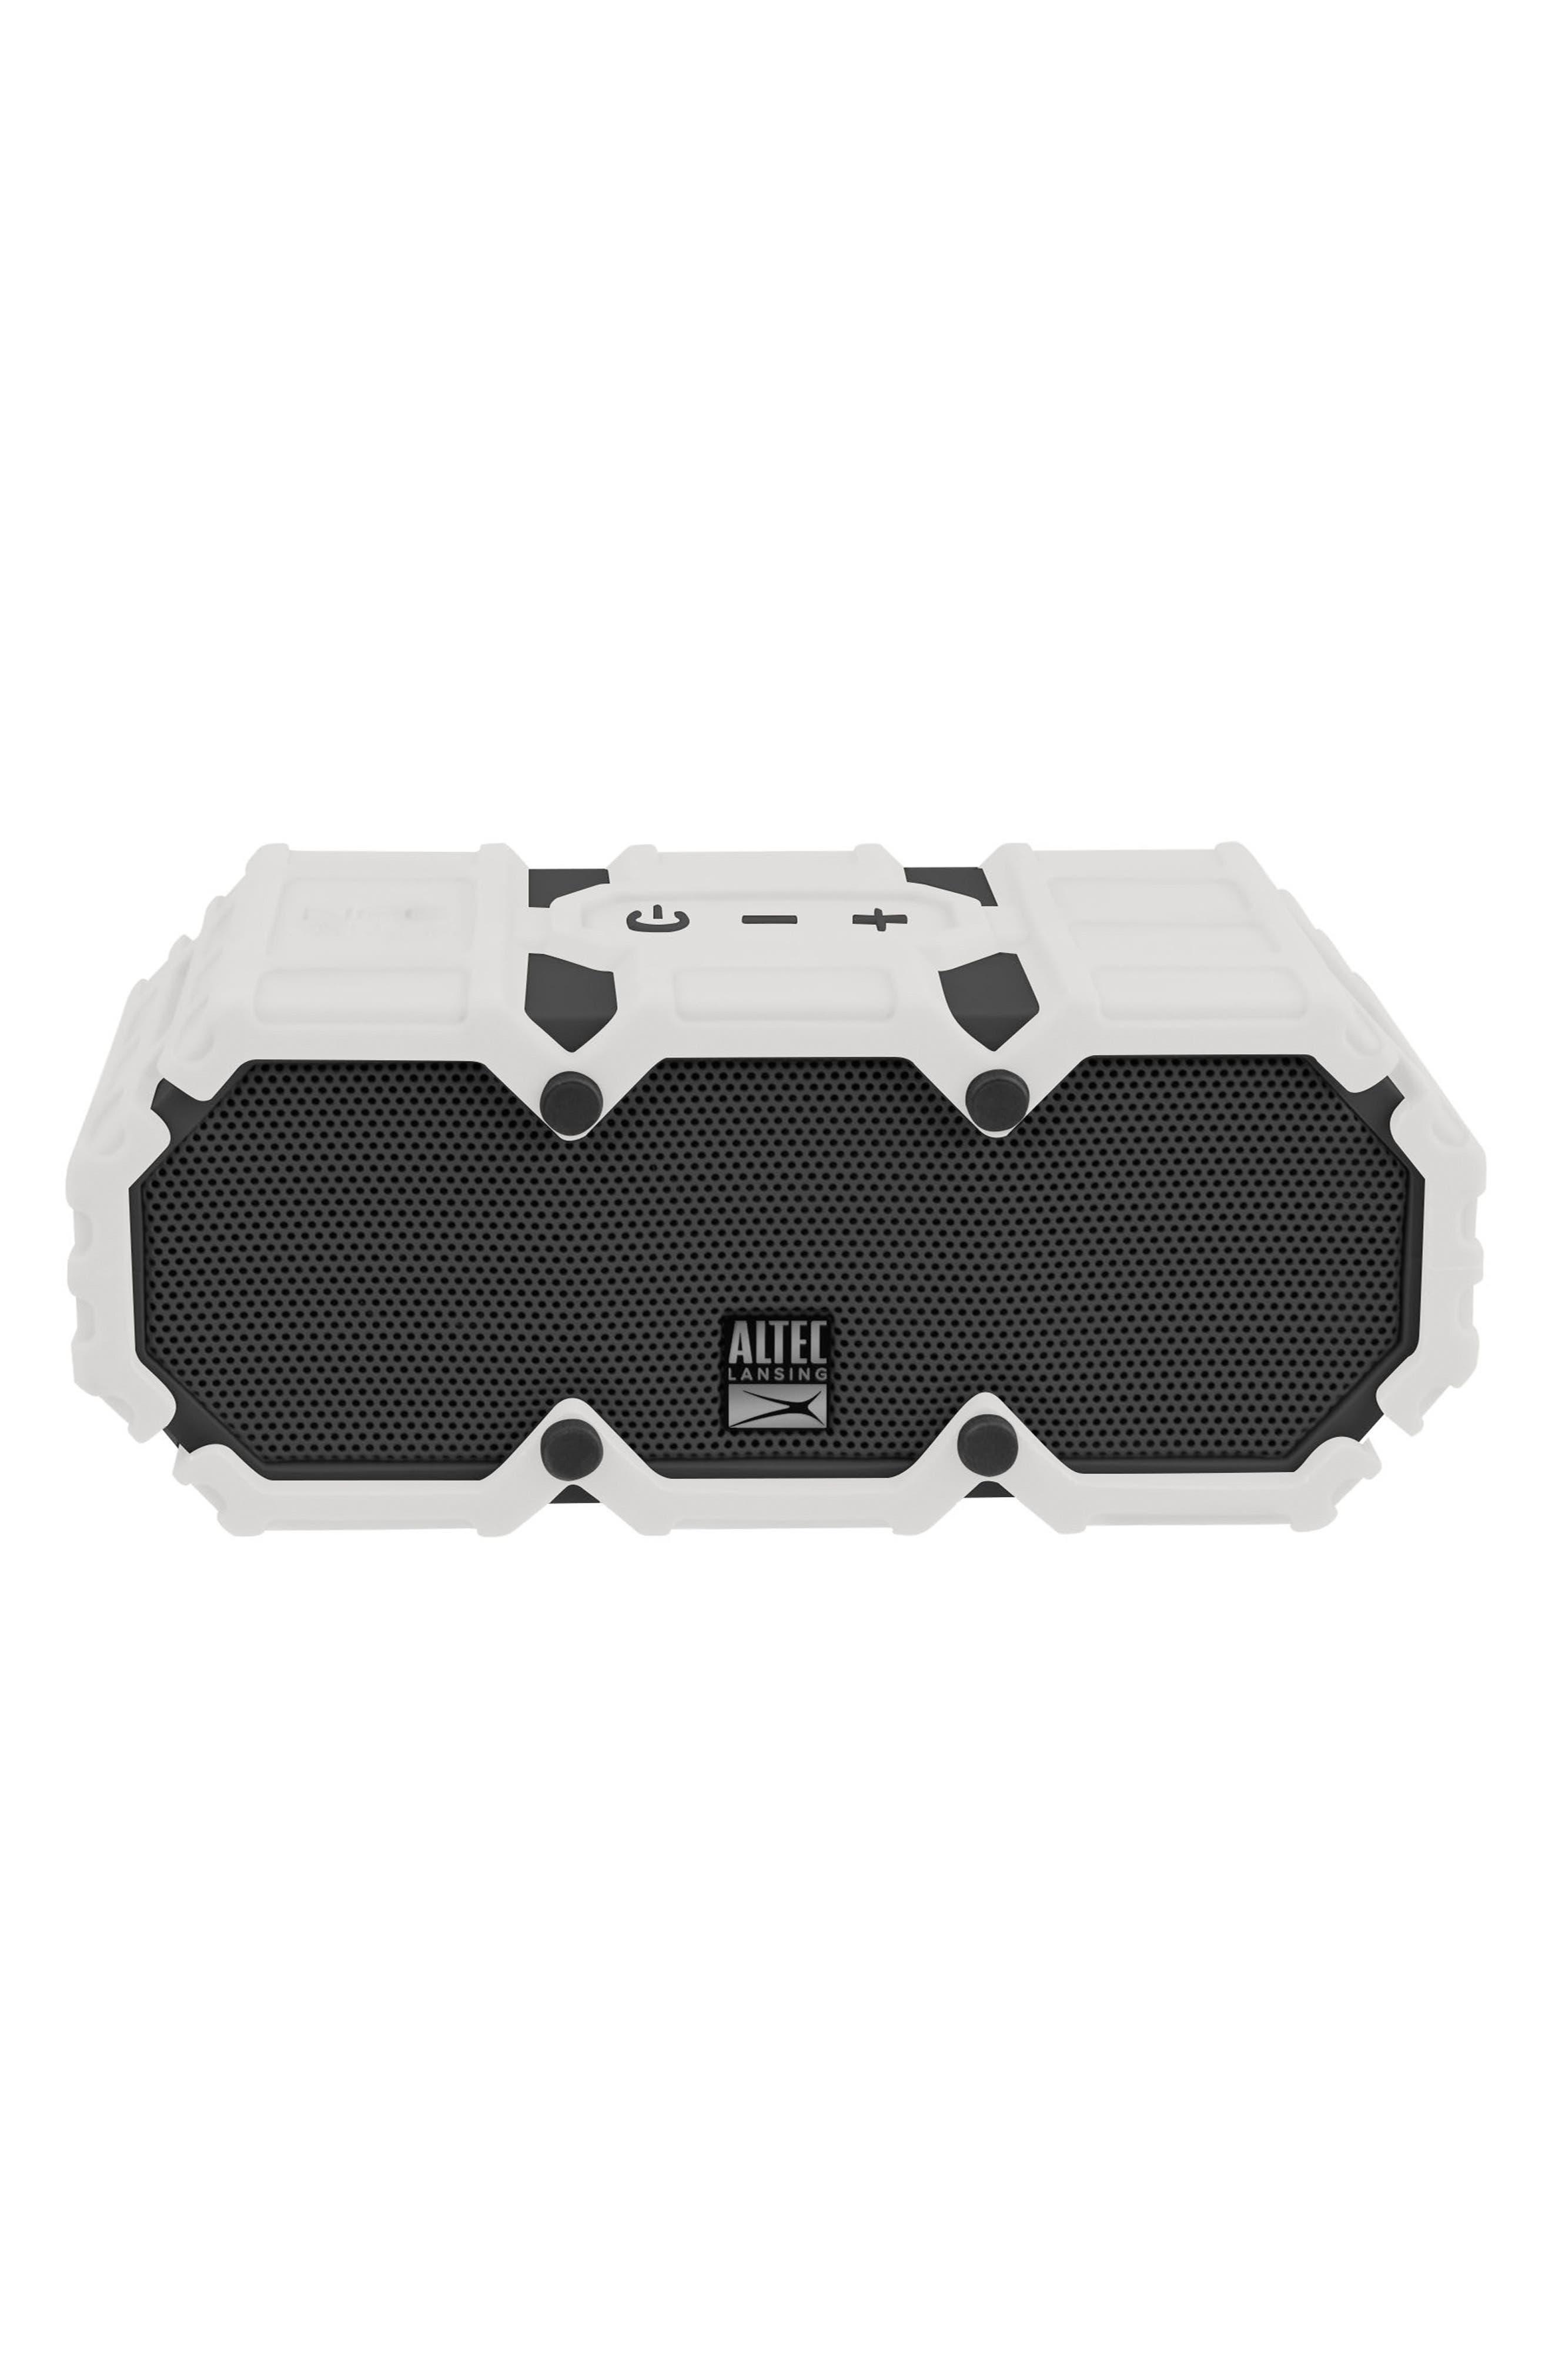 Mini Lifejacket S3 Waterproof Wireless Speaker,                         Main,                         color, WHITE/ GRAPHITE